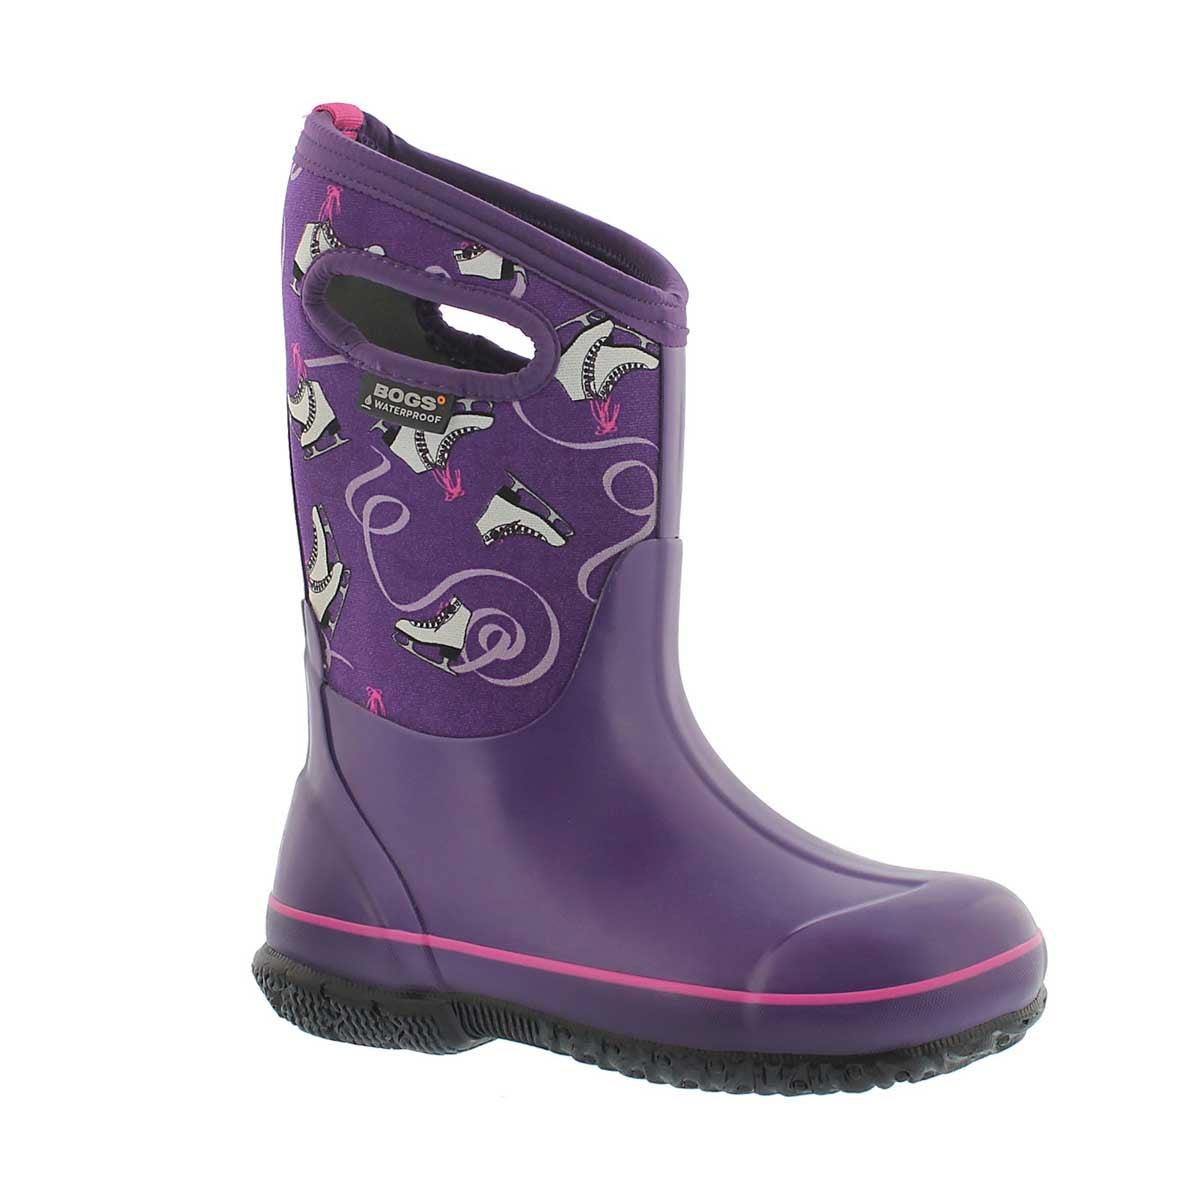 Girls' CLASSIC ICE SKATES purple multi boots